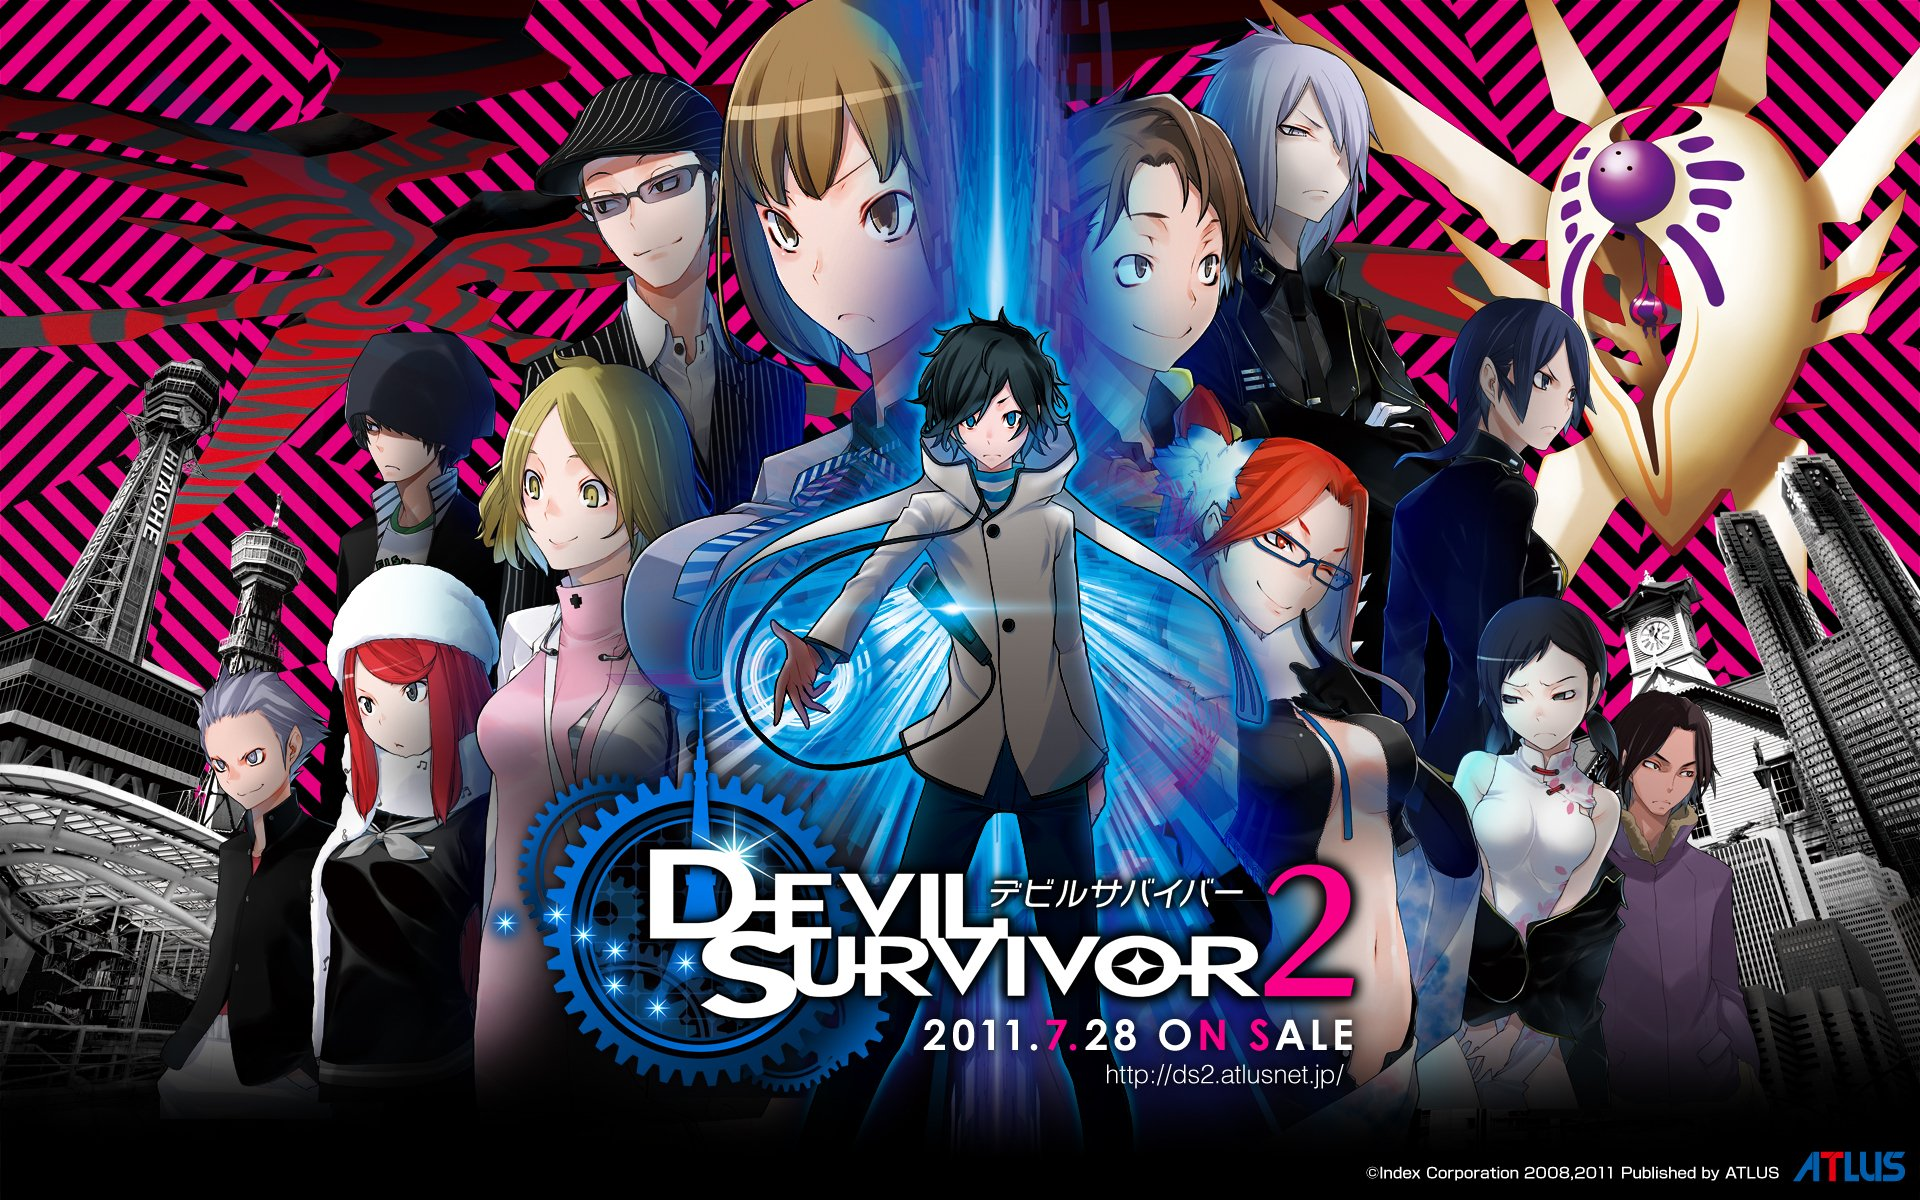 Devil Survivor 2 The Animation: Episódio 1 ao 13